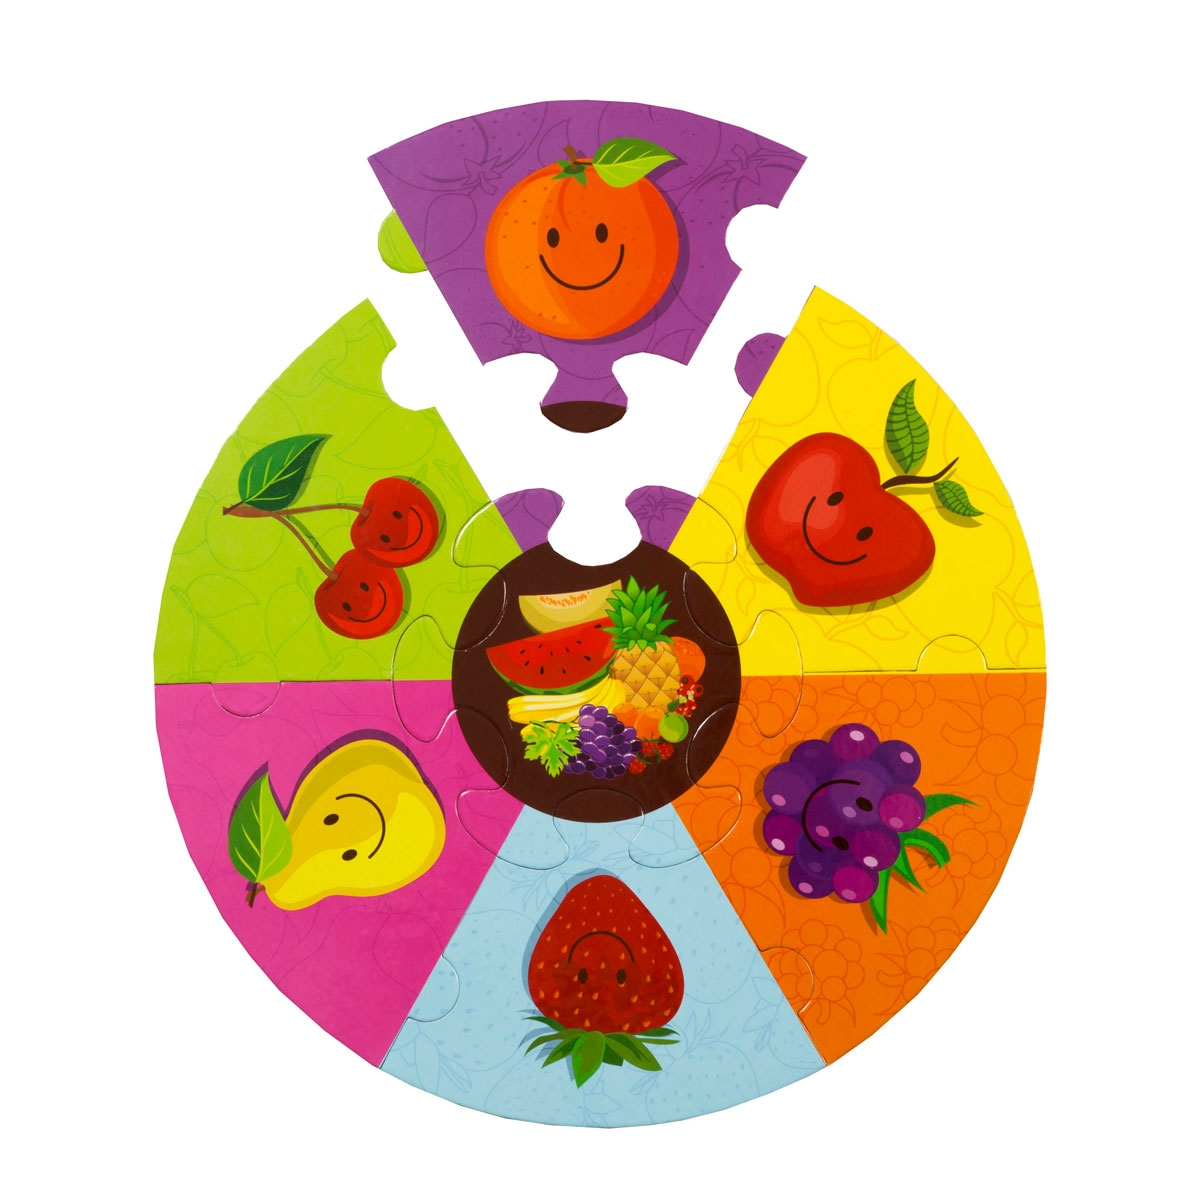 Round Puzzle - Fruits